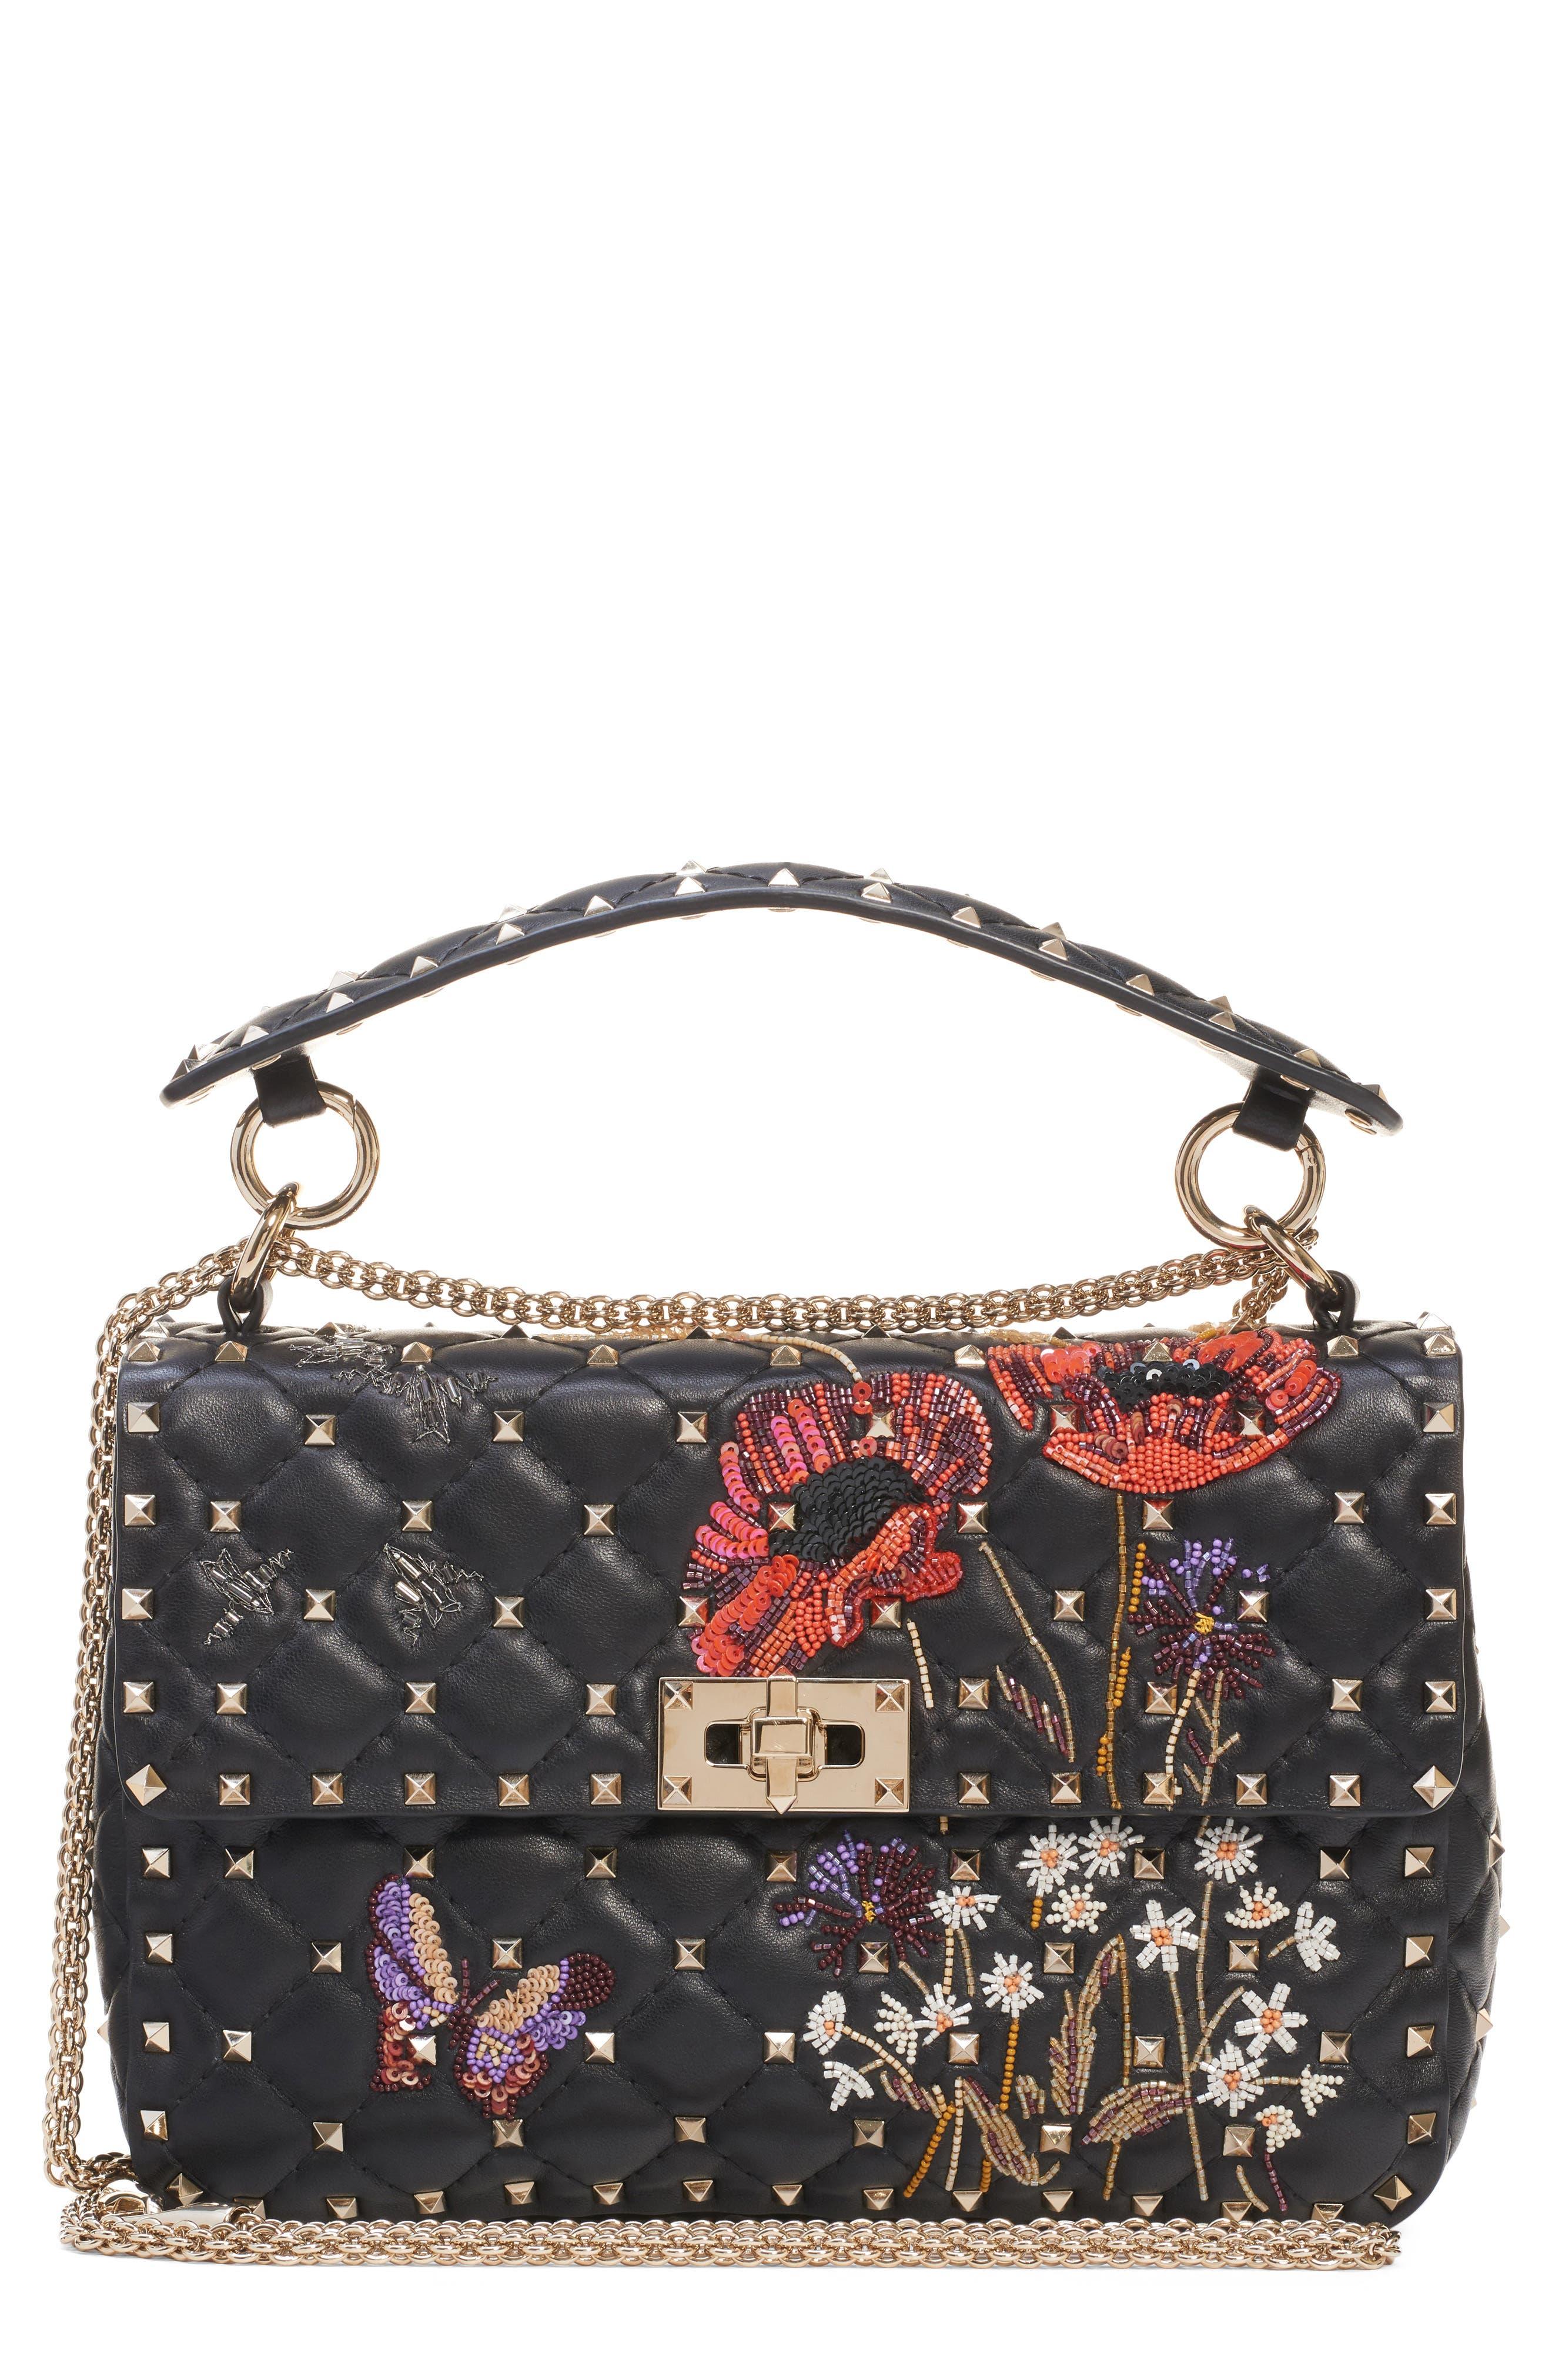 141b83ae6c31 sequin purse